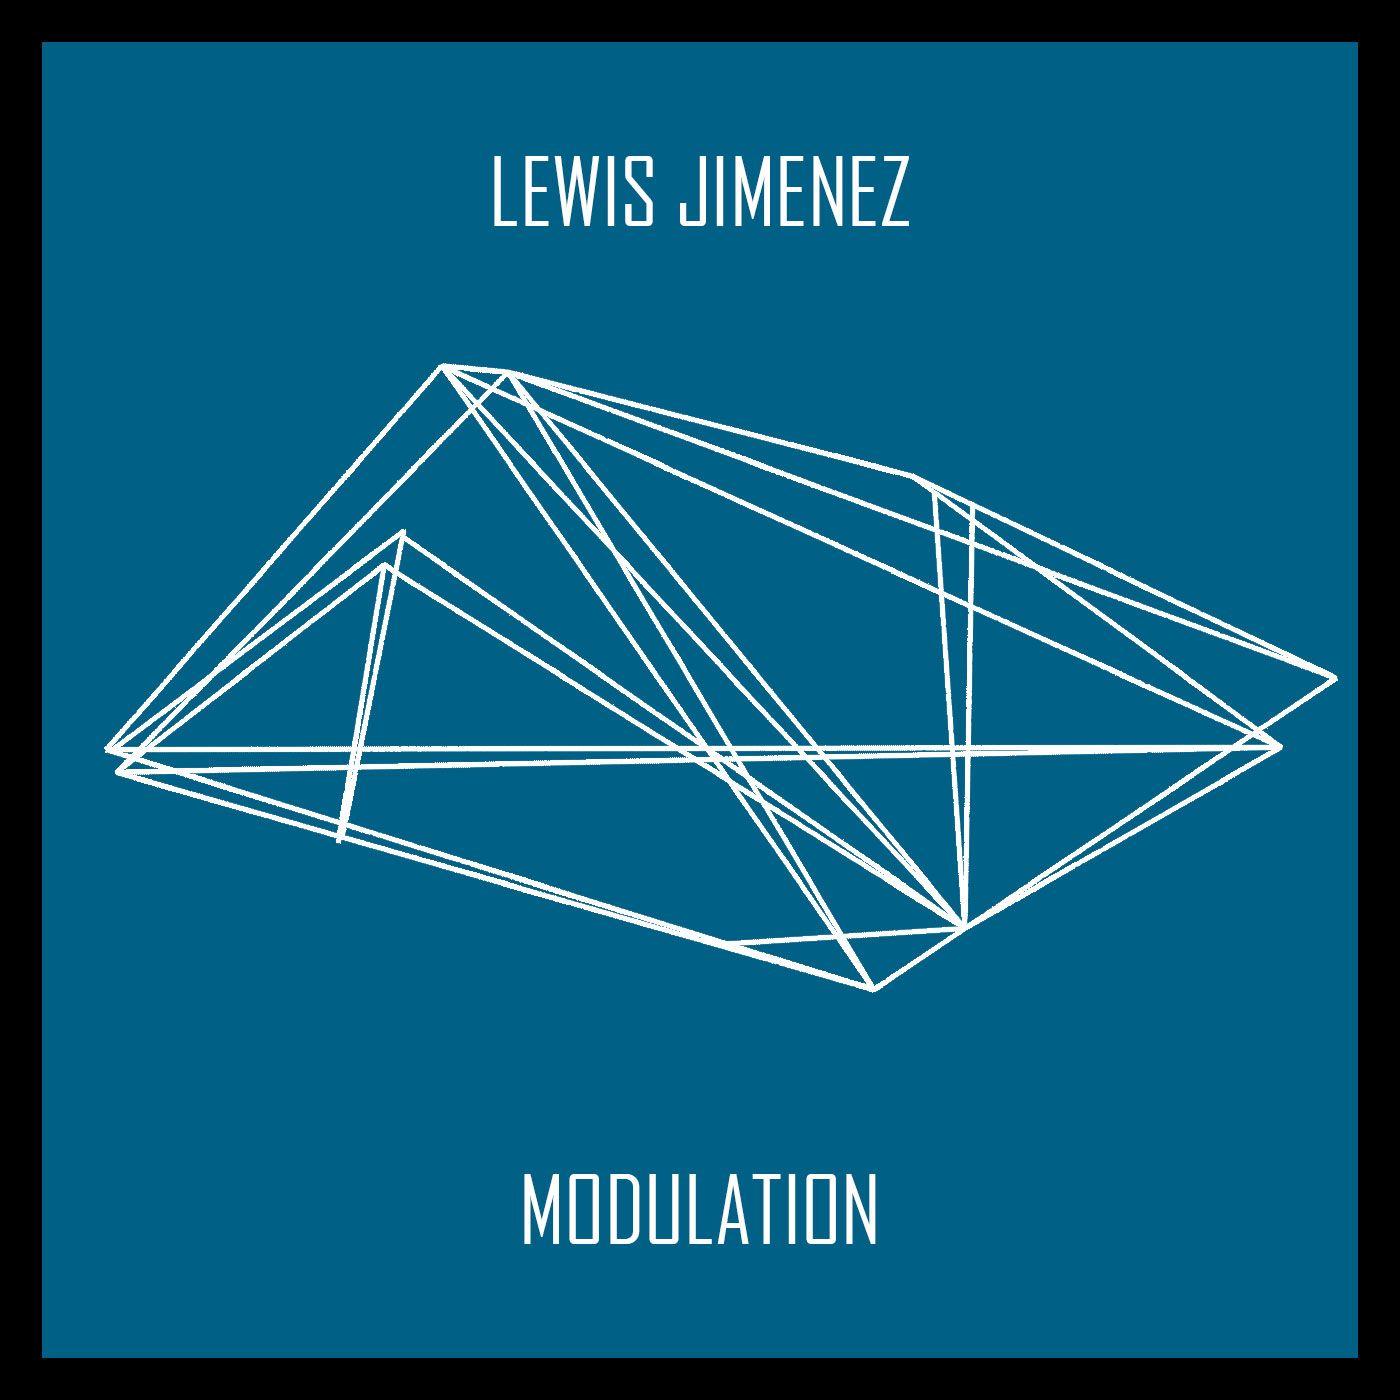 modulationep2.jpg